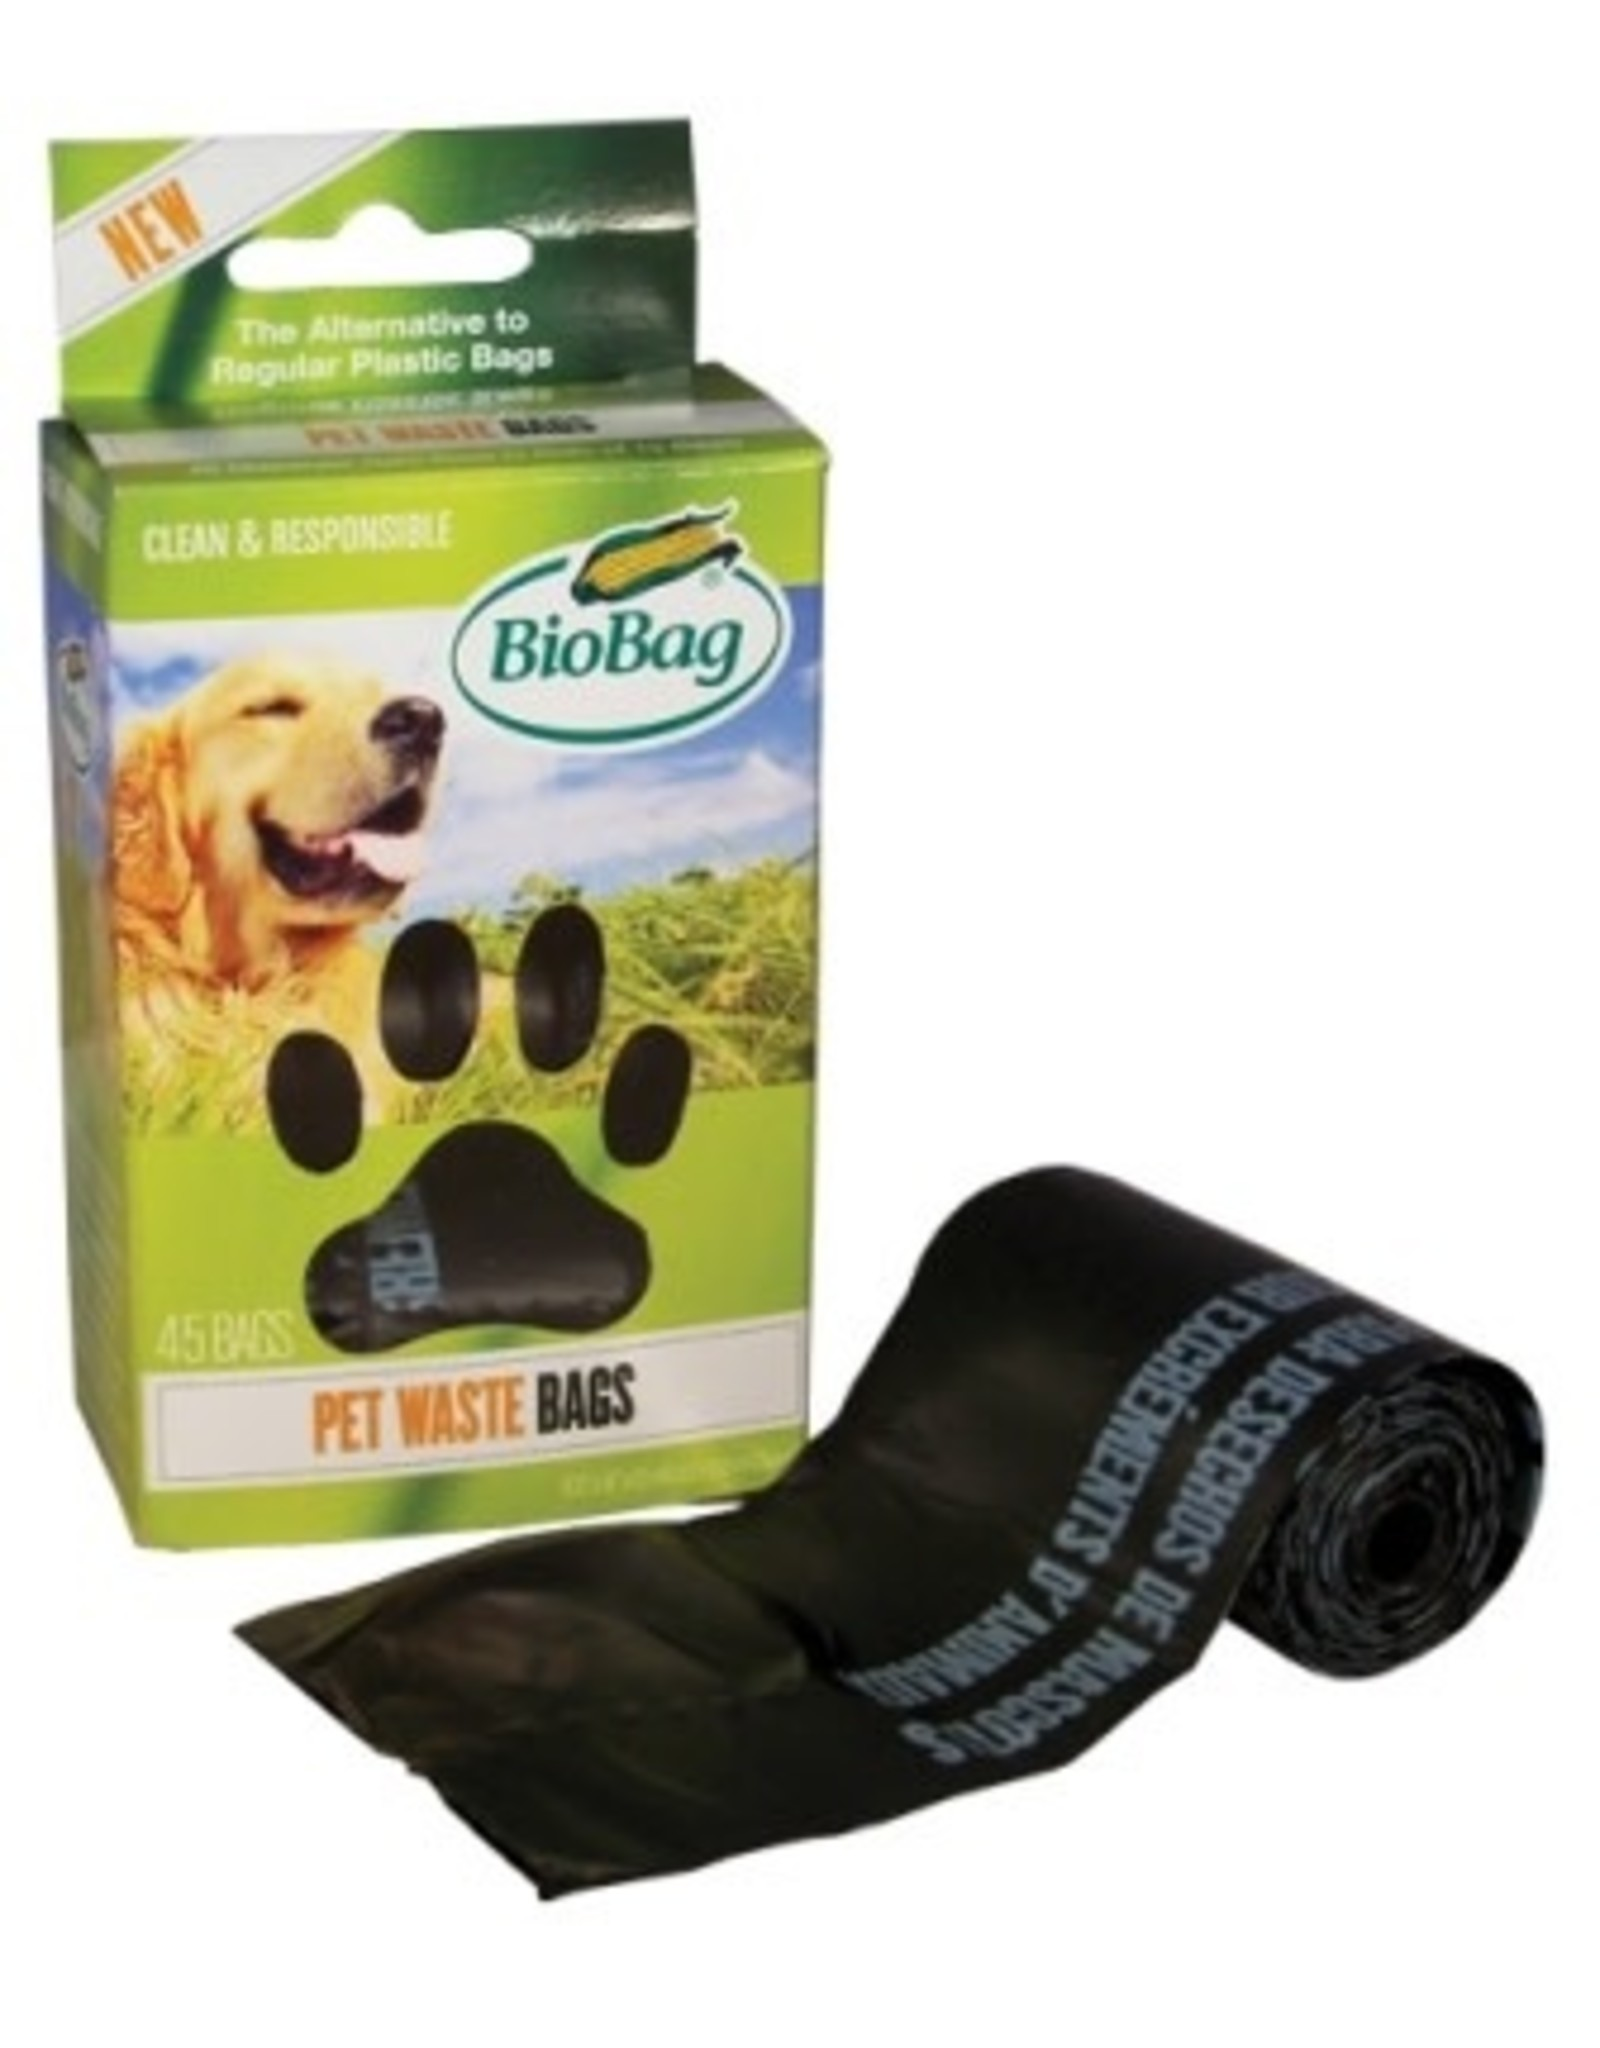 Bio Bag Bio Bag Compostable Dog Waste Bag Spindle Roll 45ct